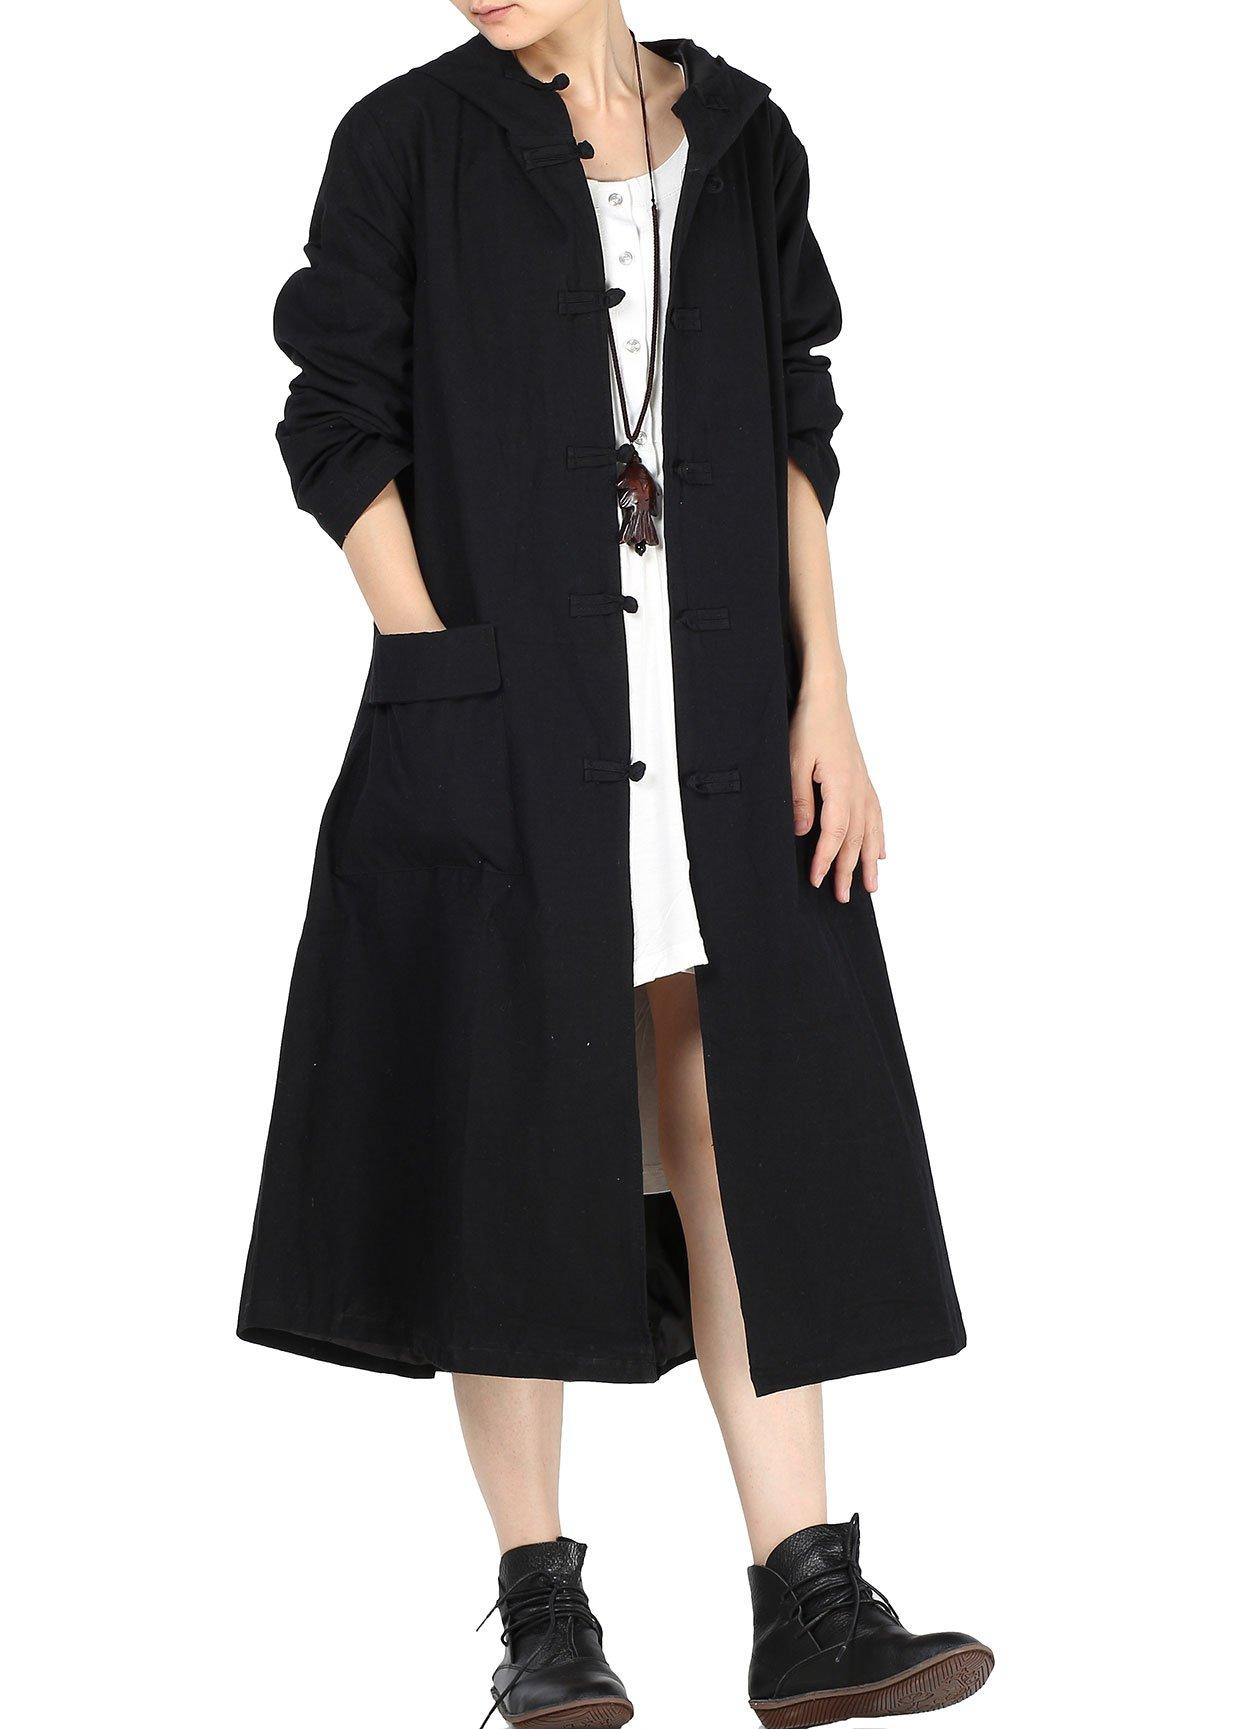 Minibee Women's Cotton Linen Button Detail Print Hood Coat Style 3 Black